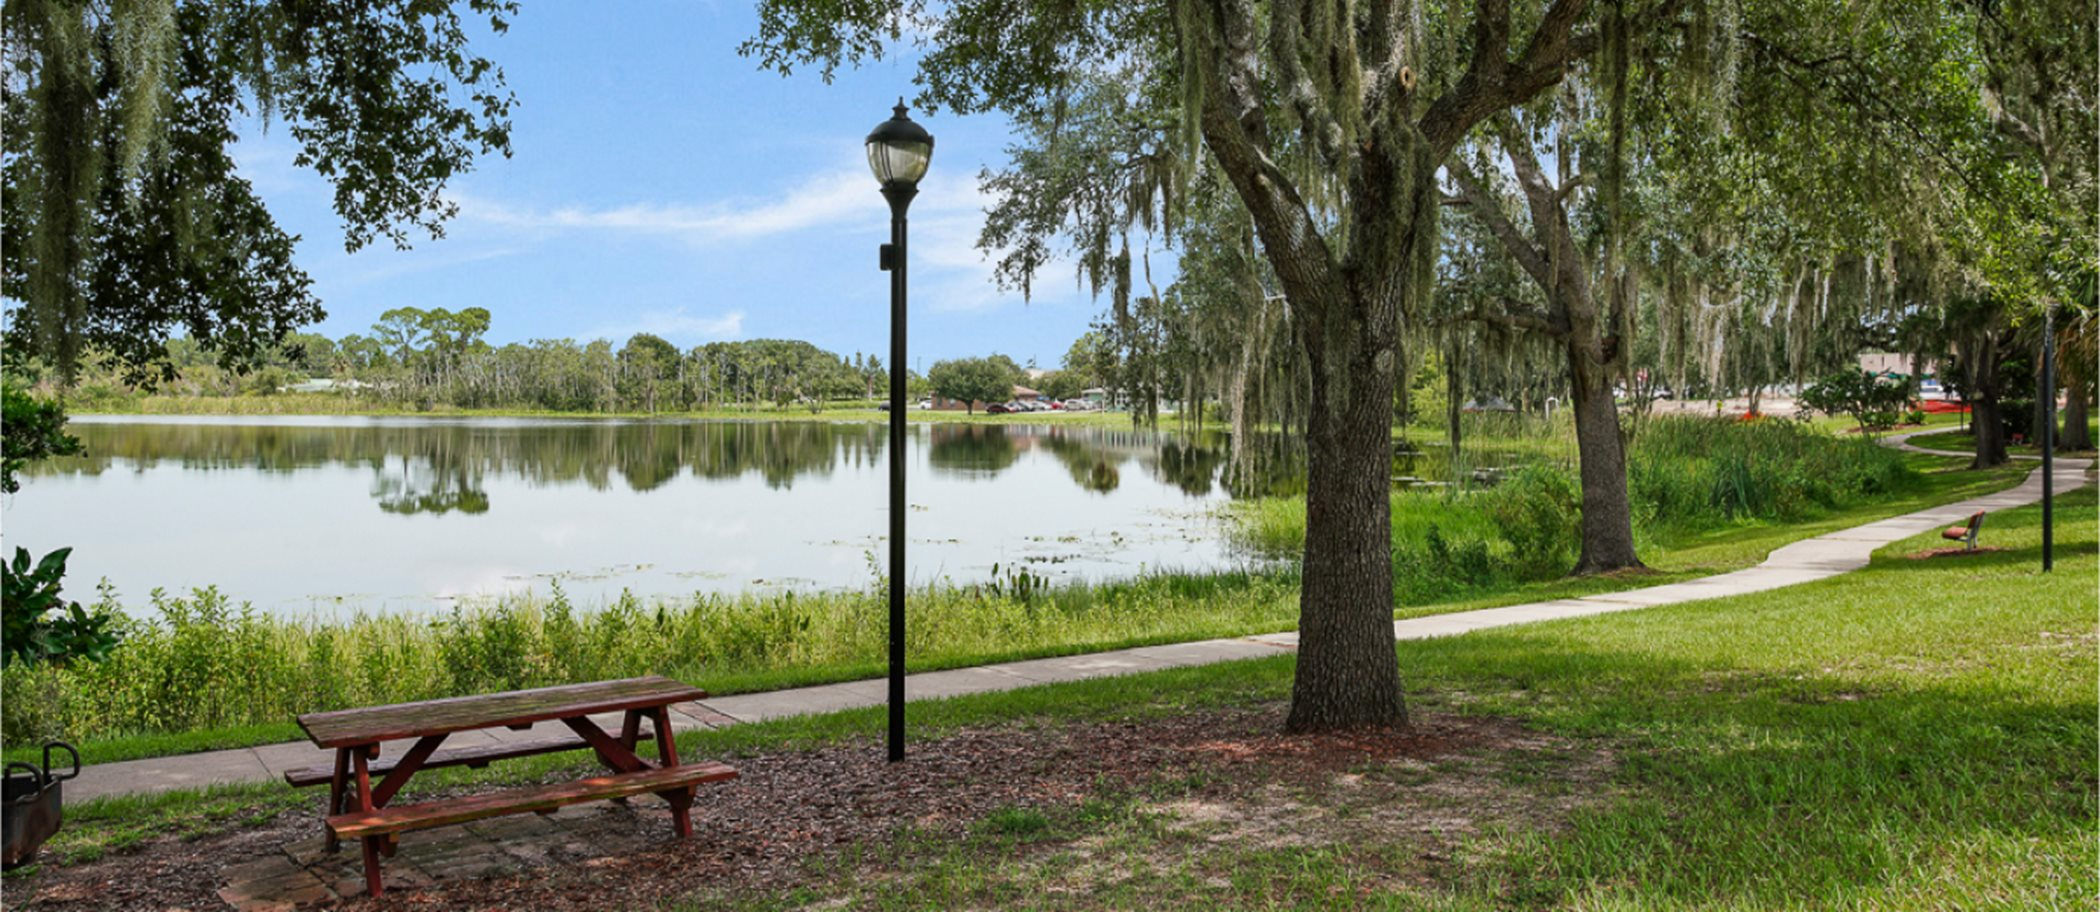 Groveland's Downtown Festival Park Pond